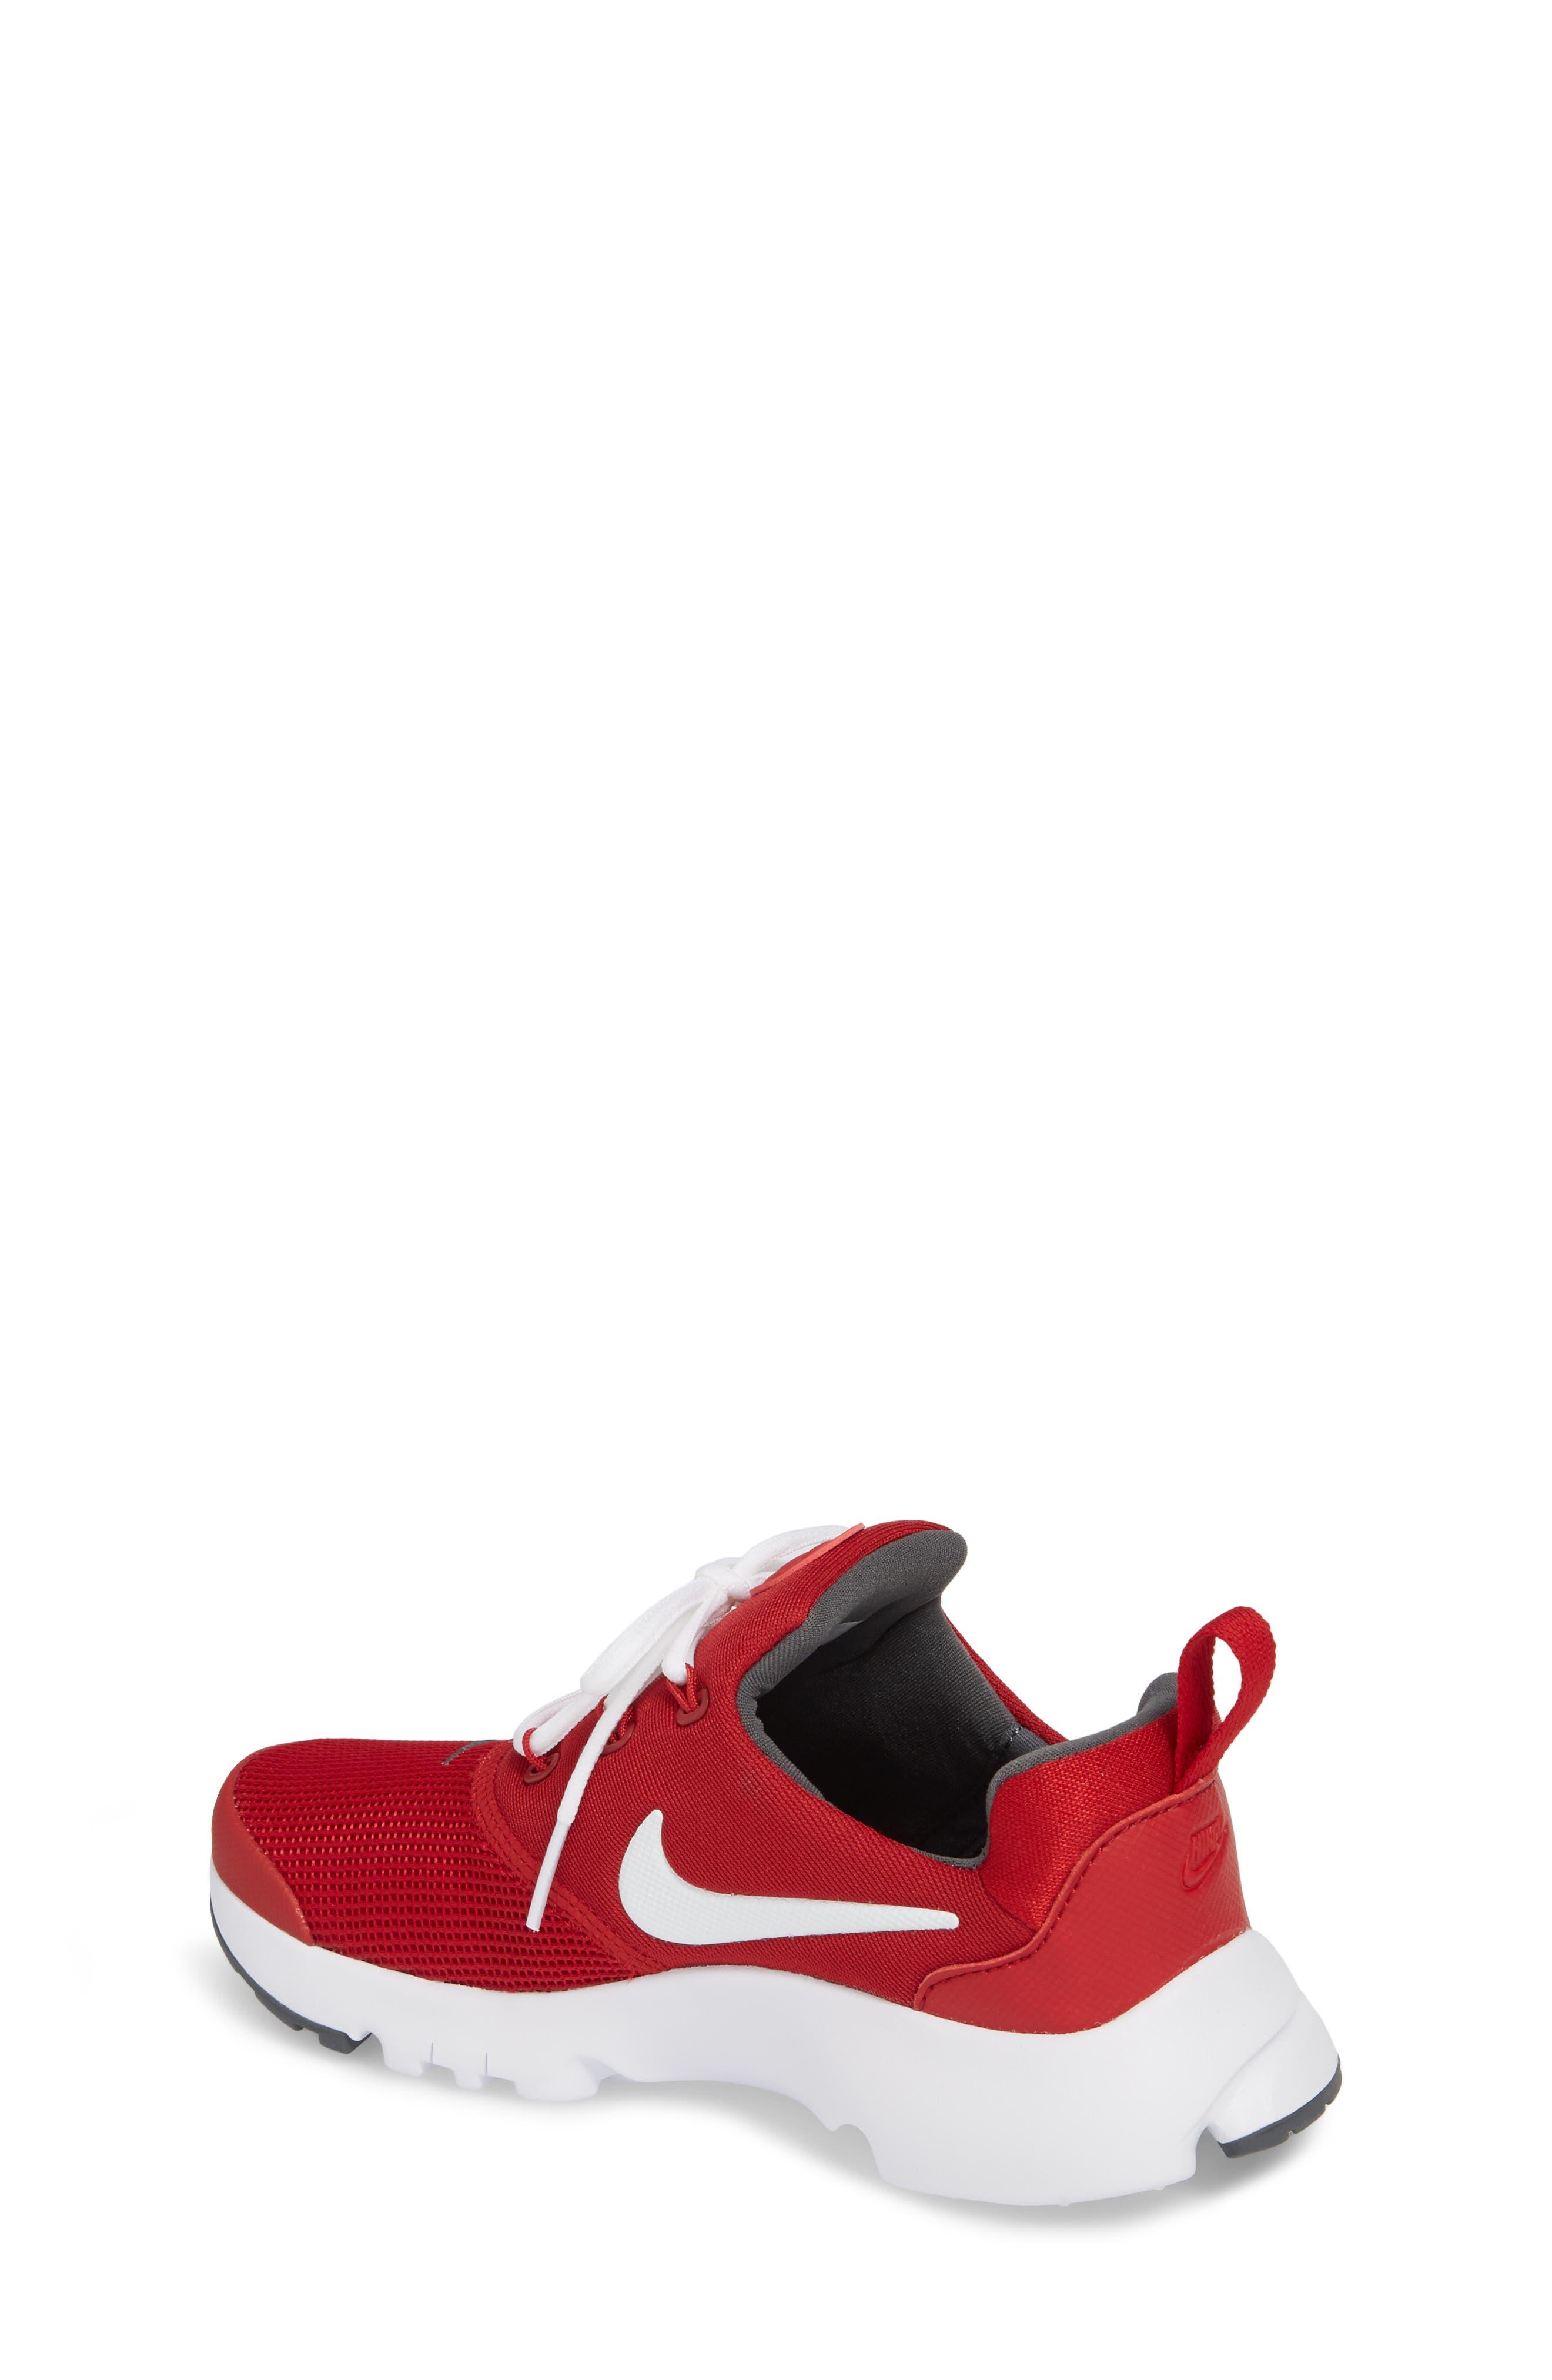 Presto Fly Sneaker,                             Alternate thumbnail 2, color,                             Gym Red/ Dark Grey/ White